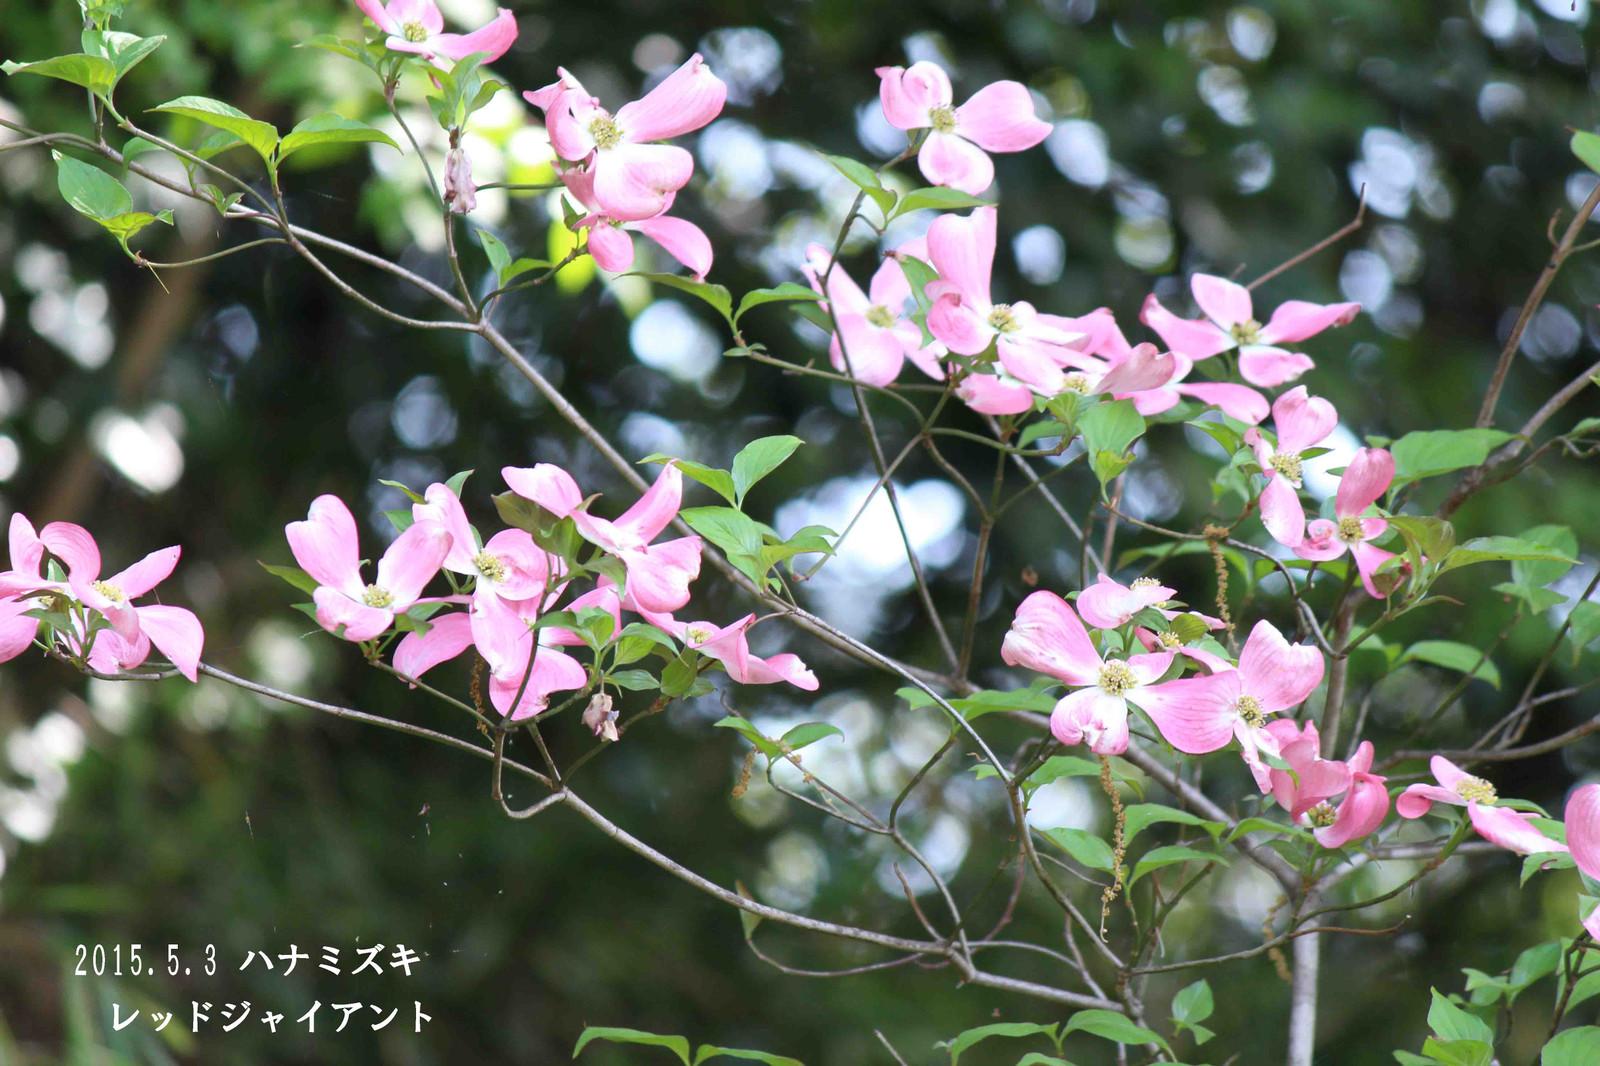 2015_05_04_8815_edited1